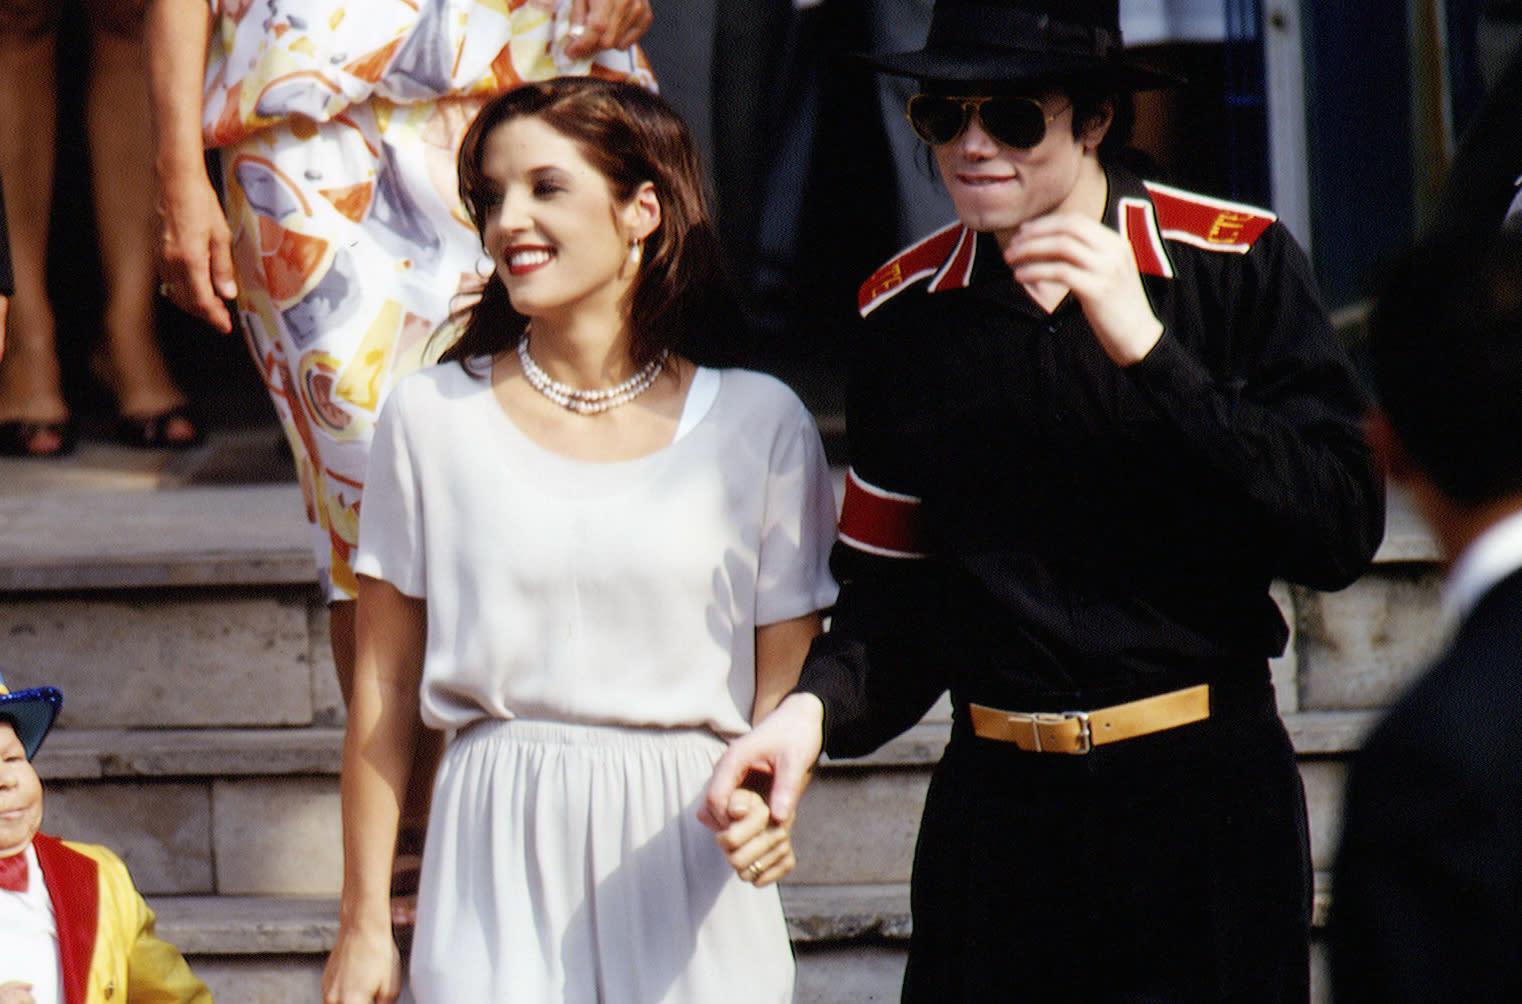 Bodyguard defends Michael Jackson